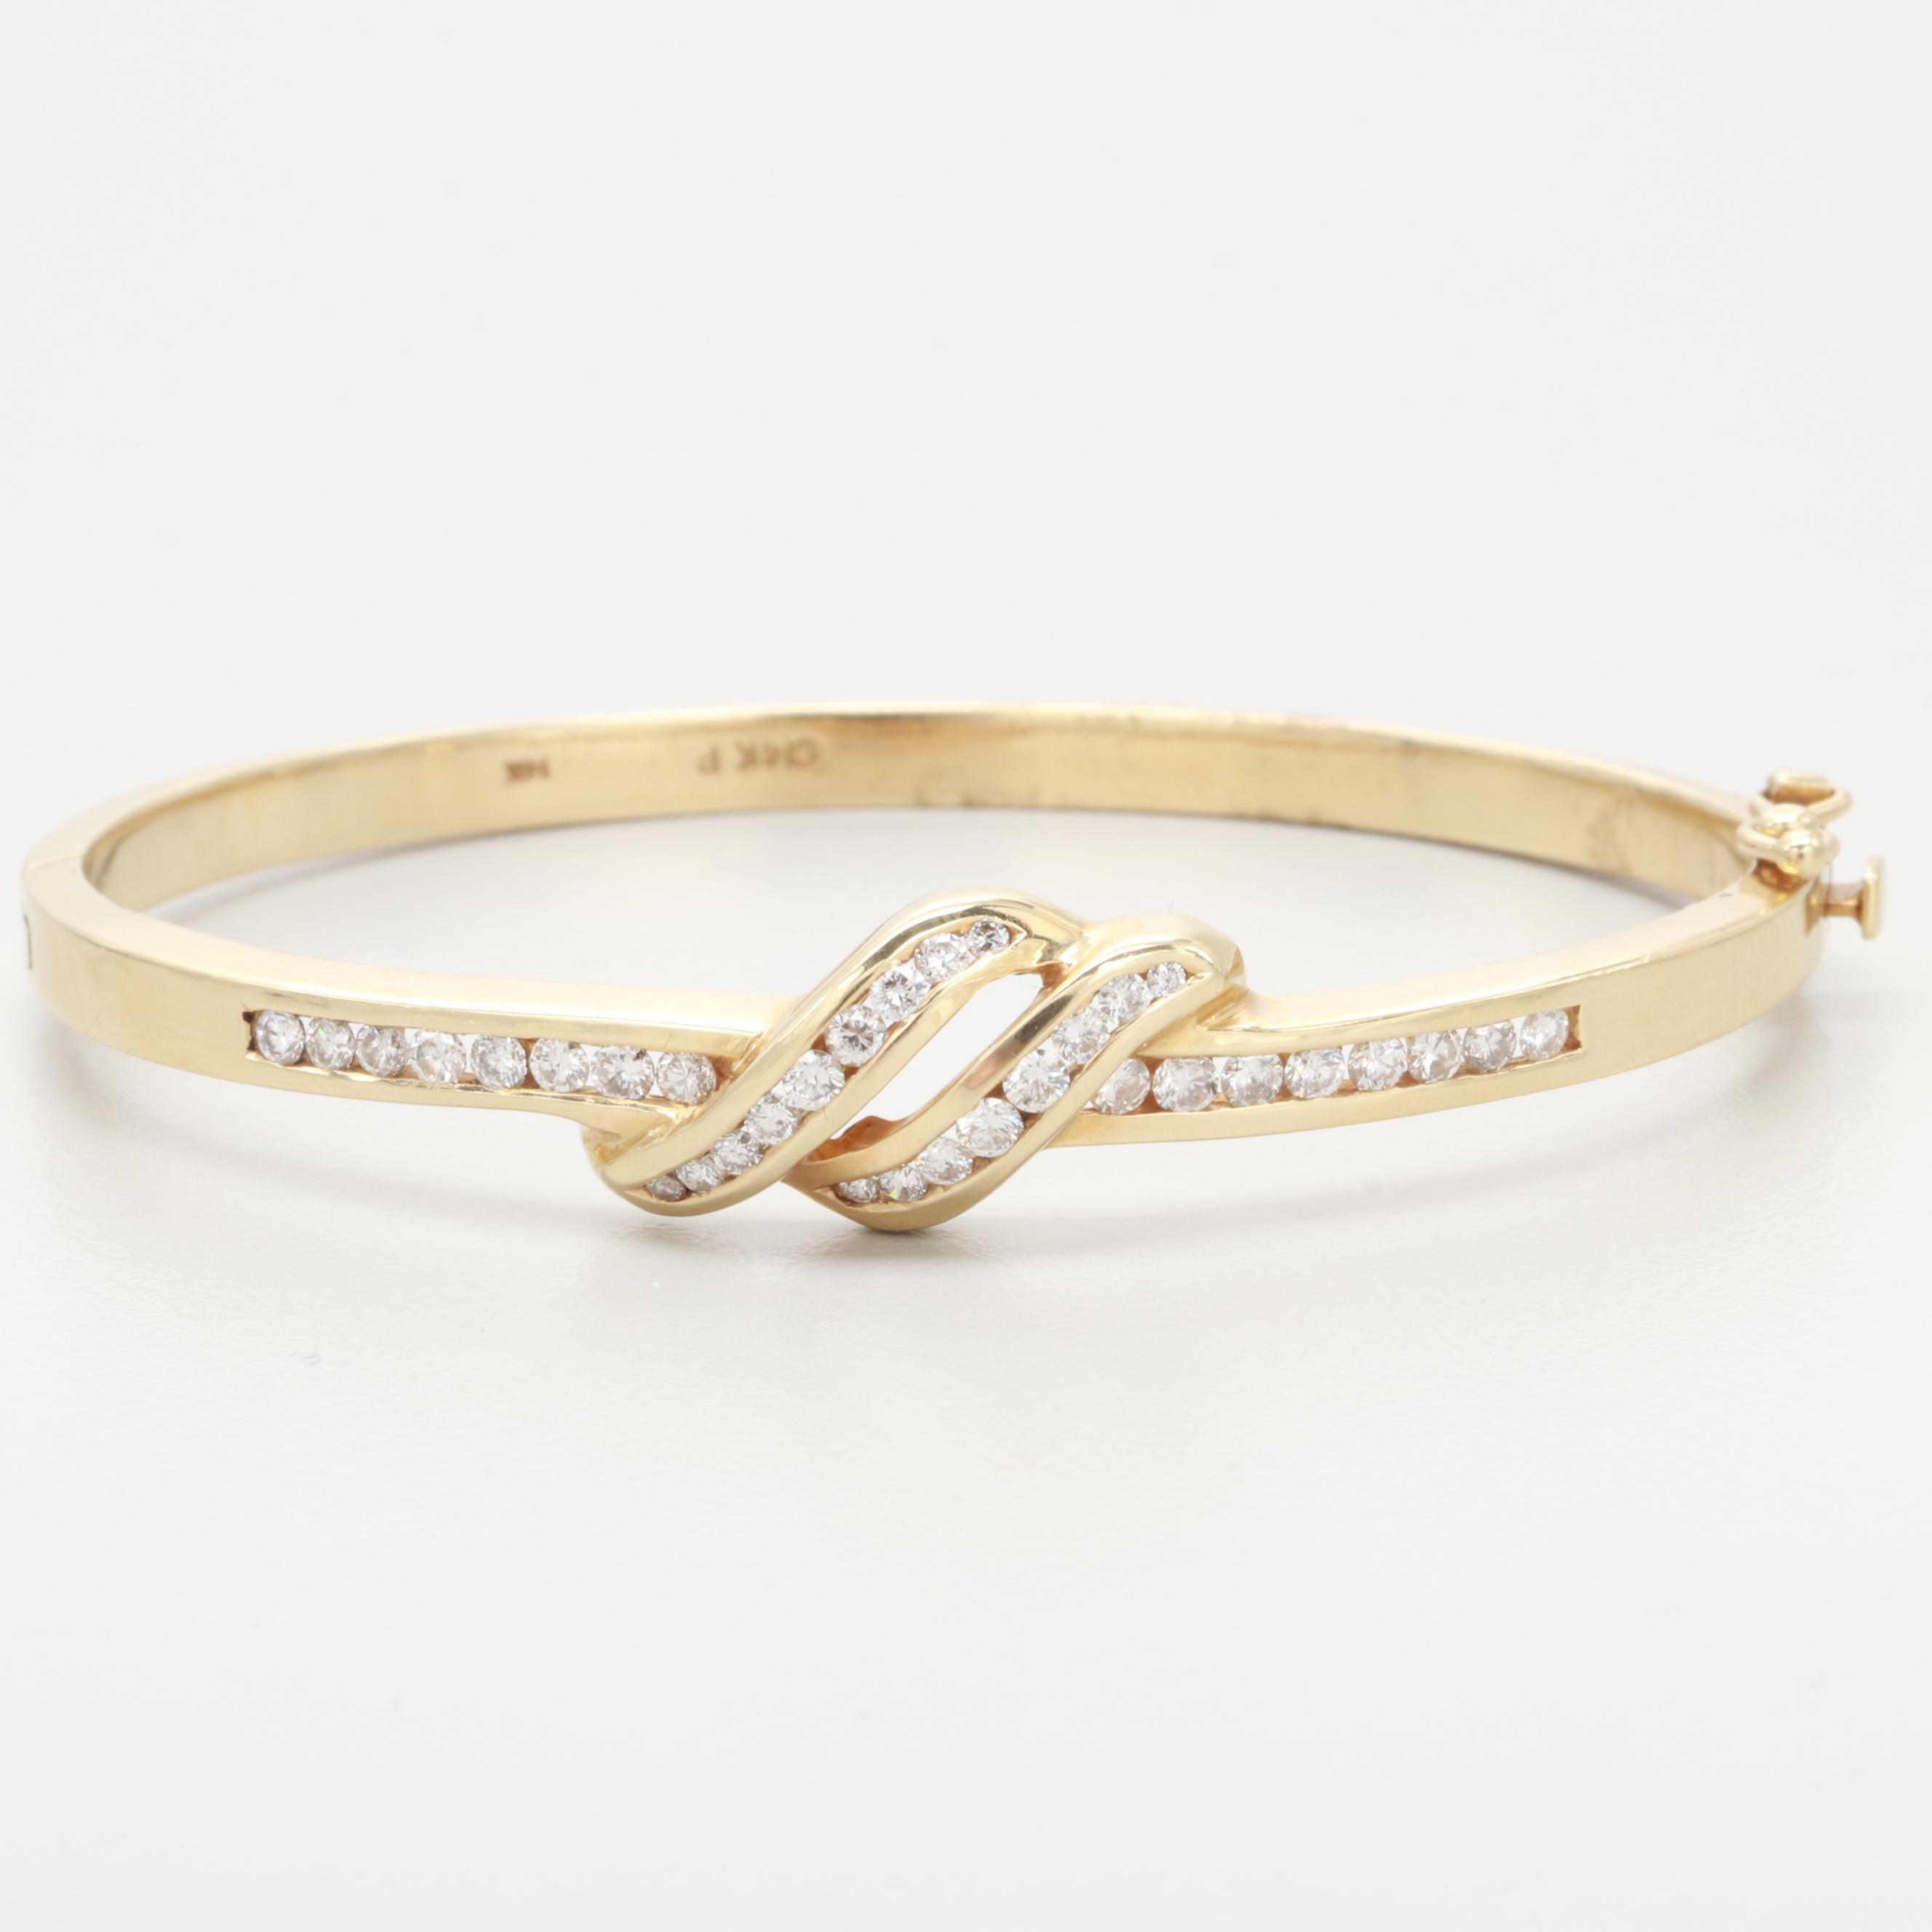 14K Yellow Gold Diamond Hinged Bangle Bracelet